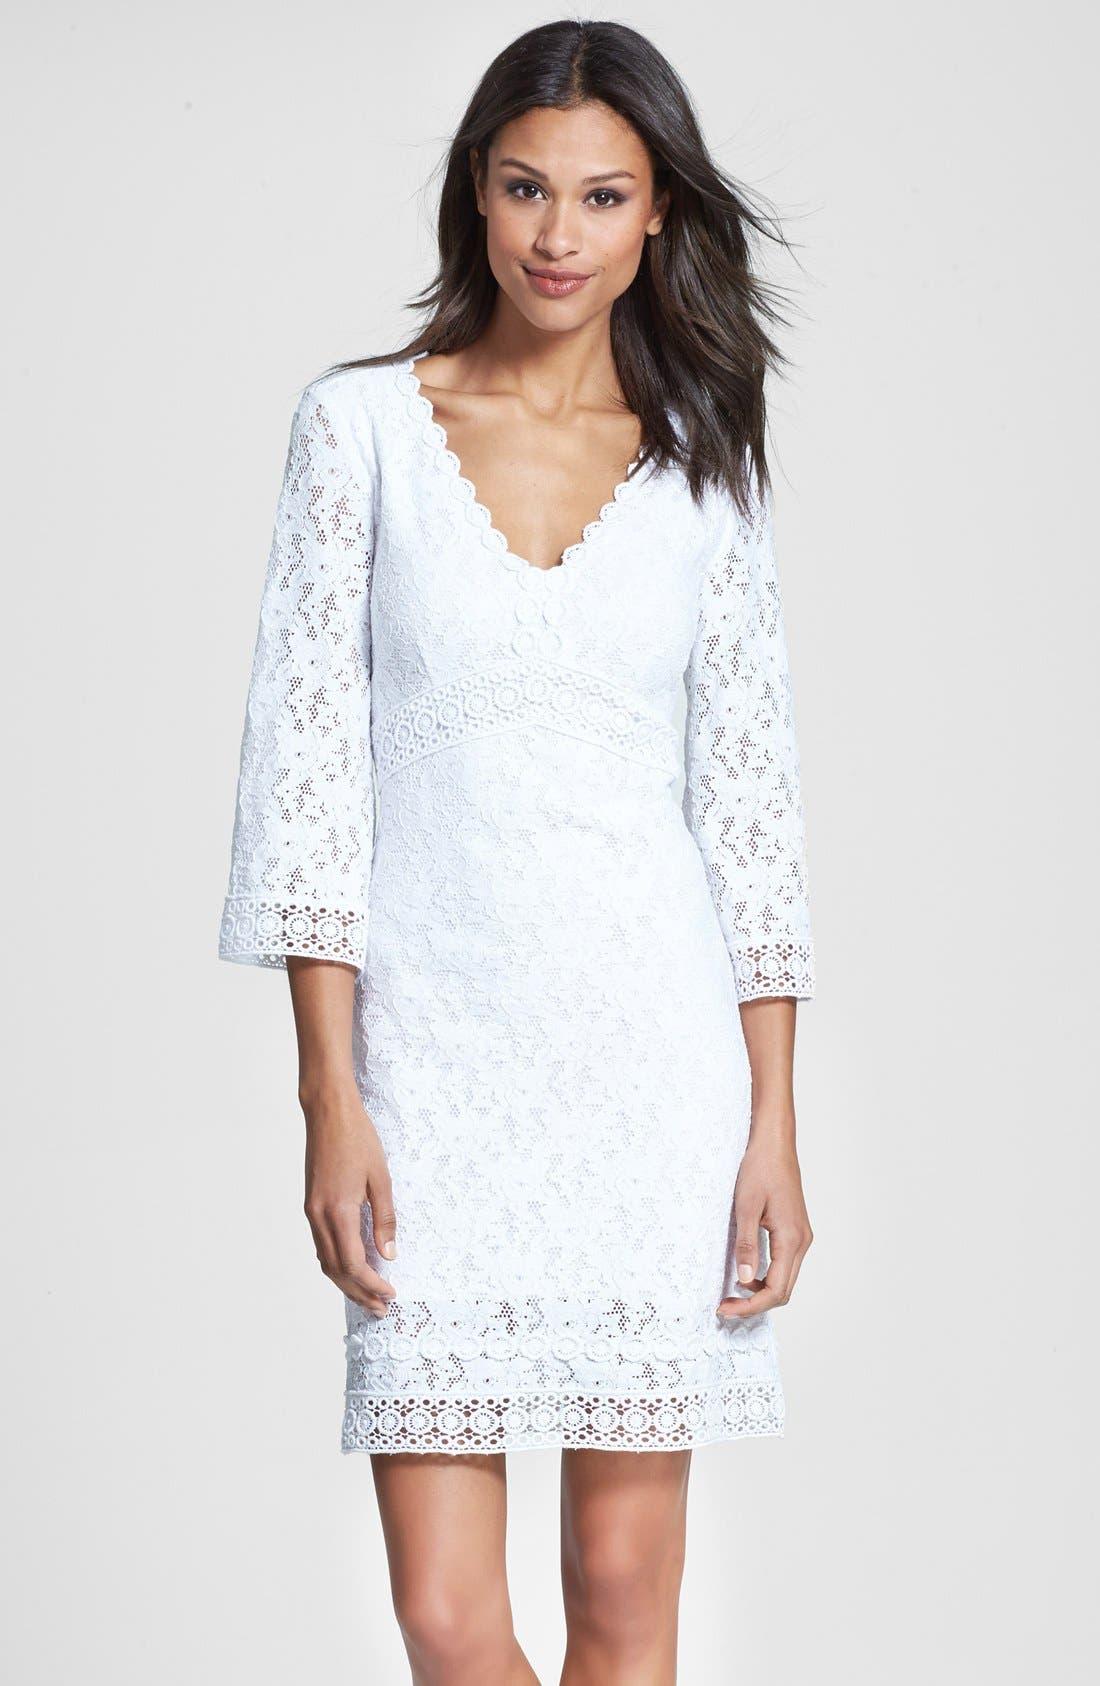 Alternate Image 1 Selected - Laundry by Shelli Segal Back Cutout Lace Shift Dress (Regular & Petite)